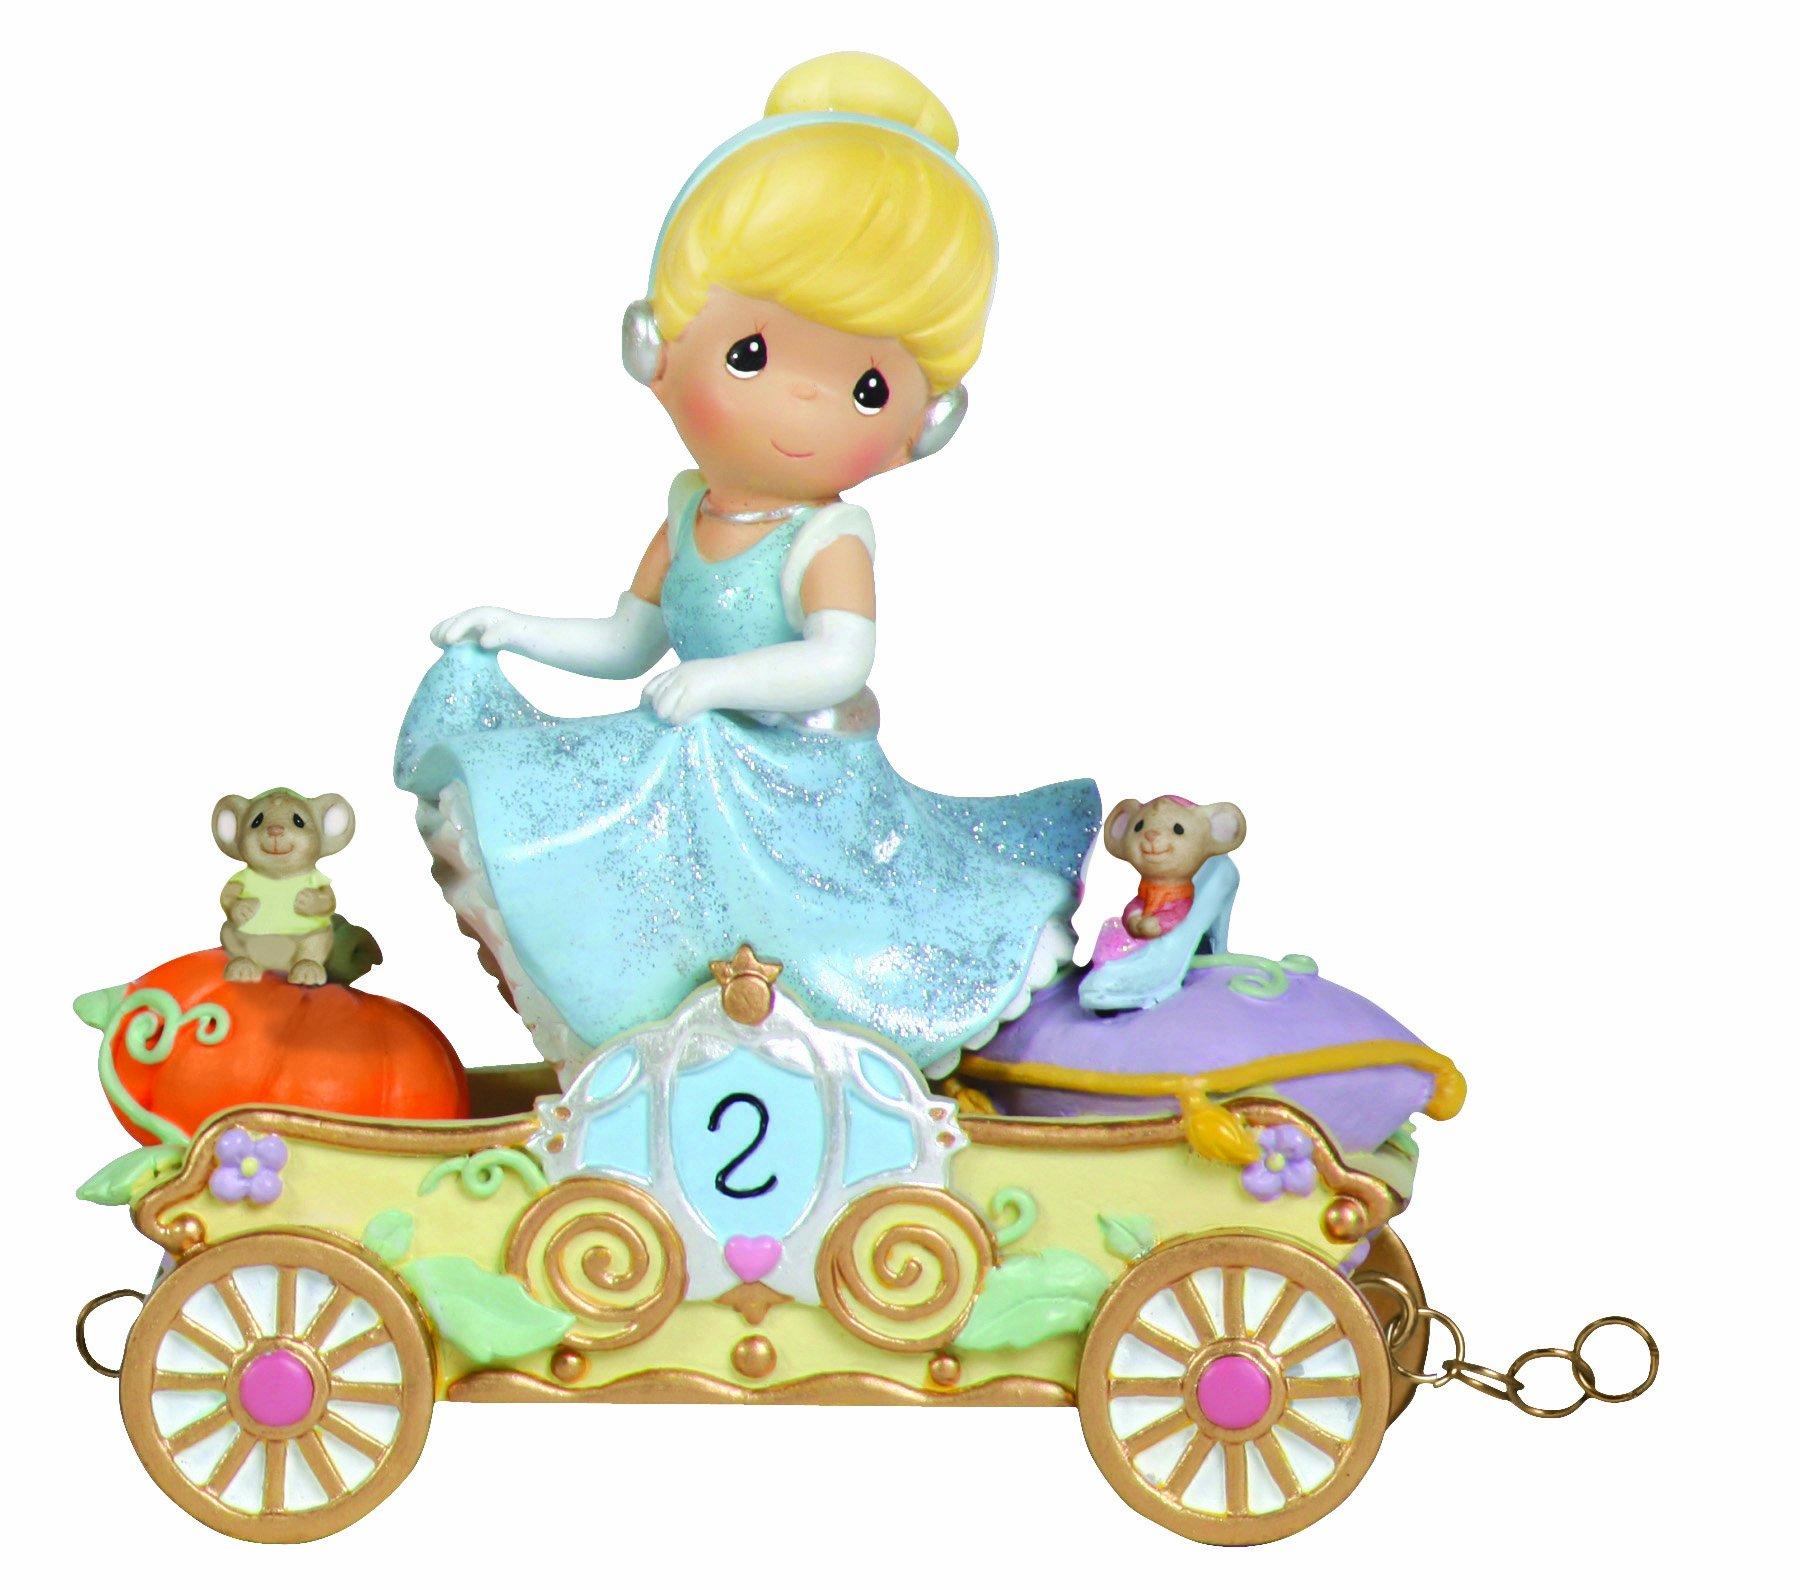 Precious Moments, Disney Showcase Collection,  Bibbidi, Bobbidi, Boo - Now You're Two!, Disney Birthday Parade, Age 2, Resin Figurine, 104404